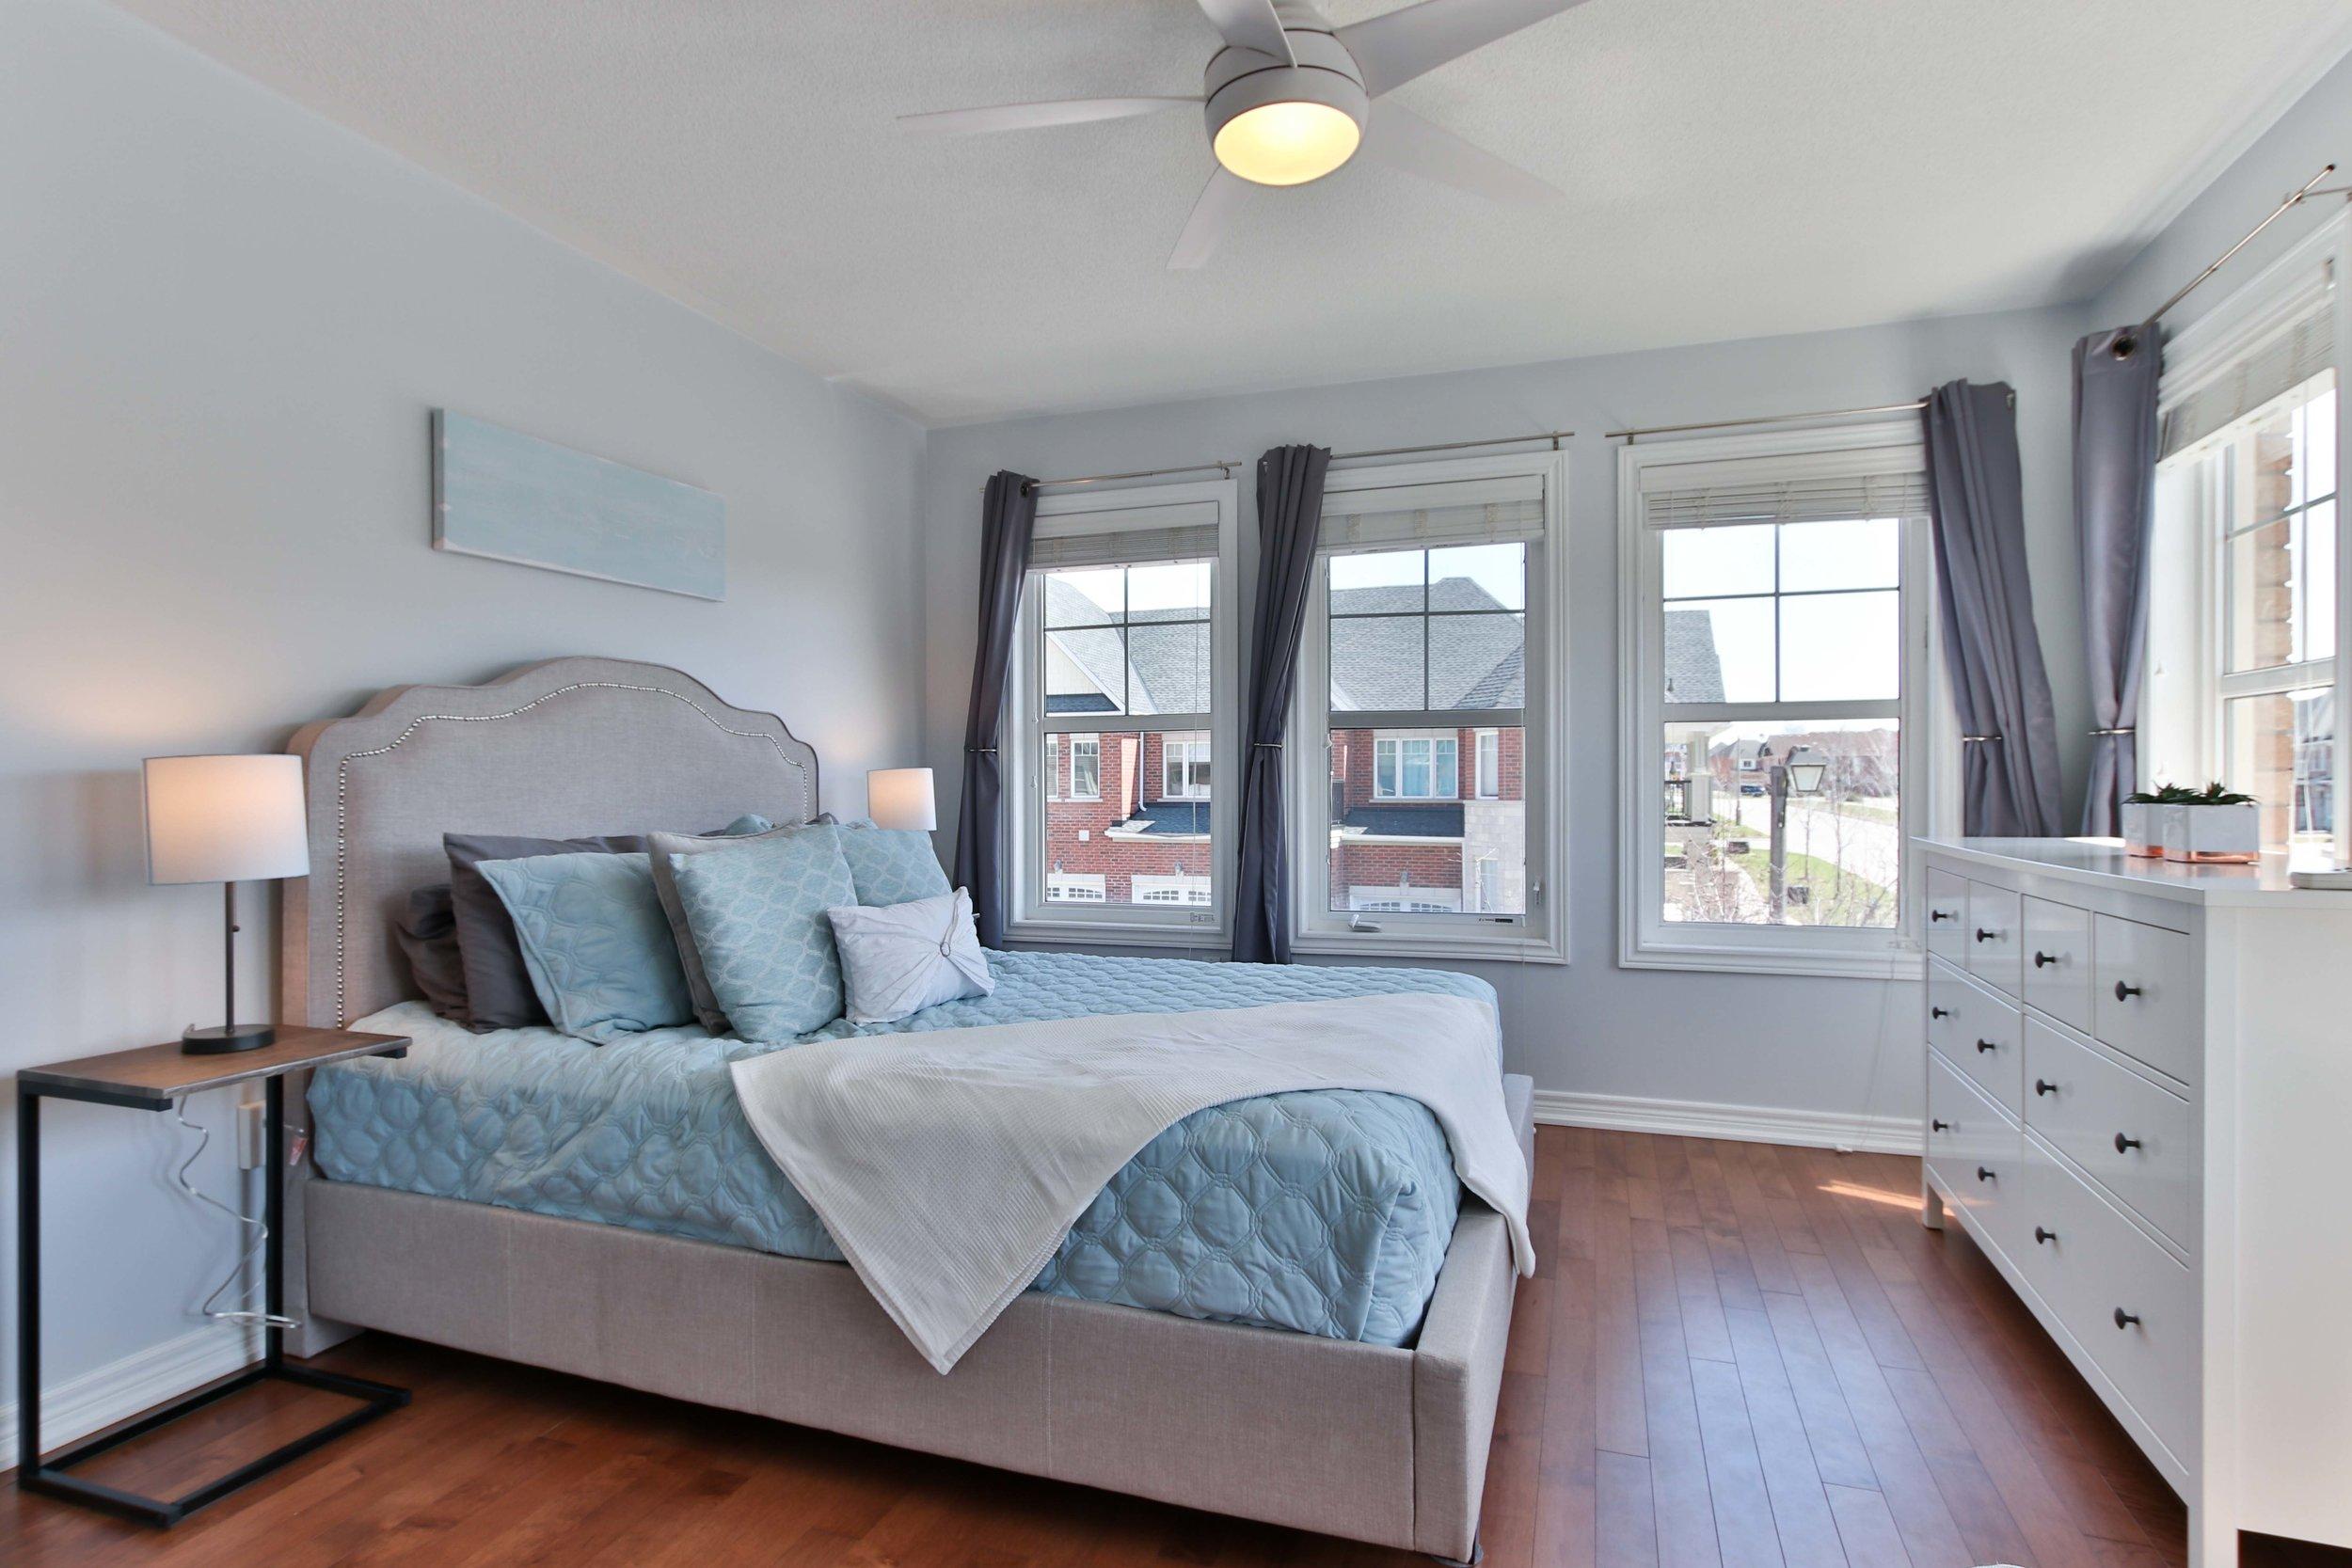 34_Bedroom.jpg